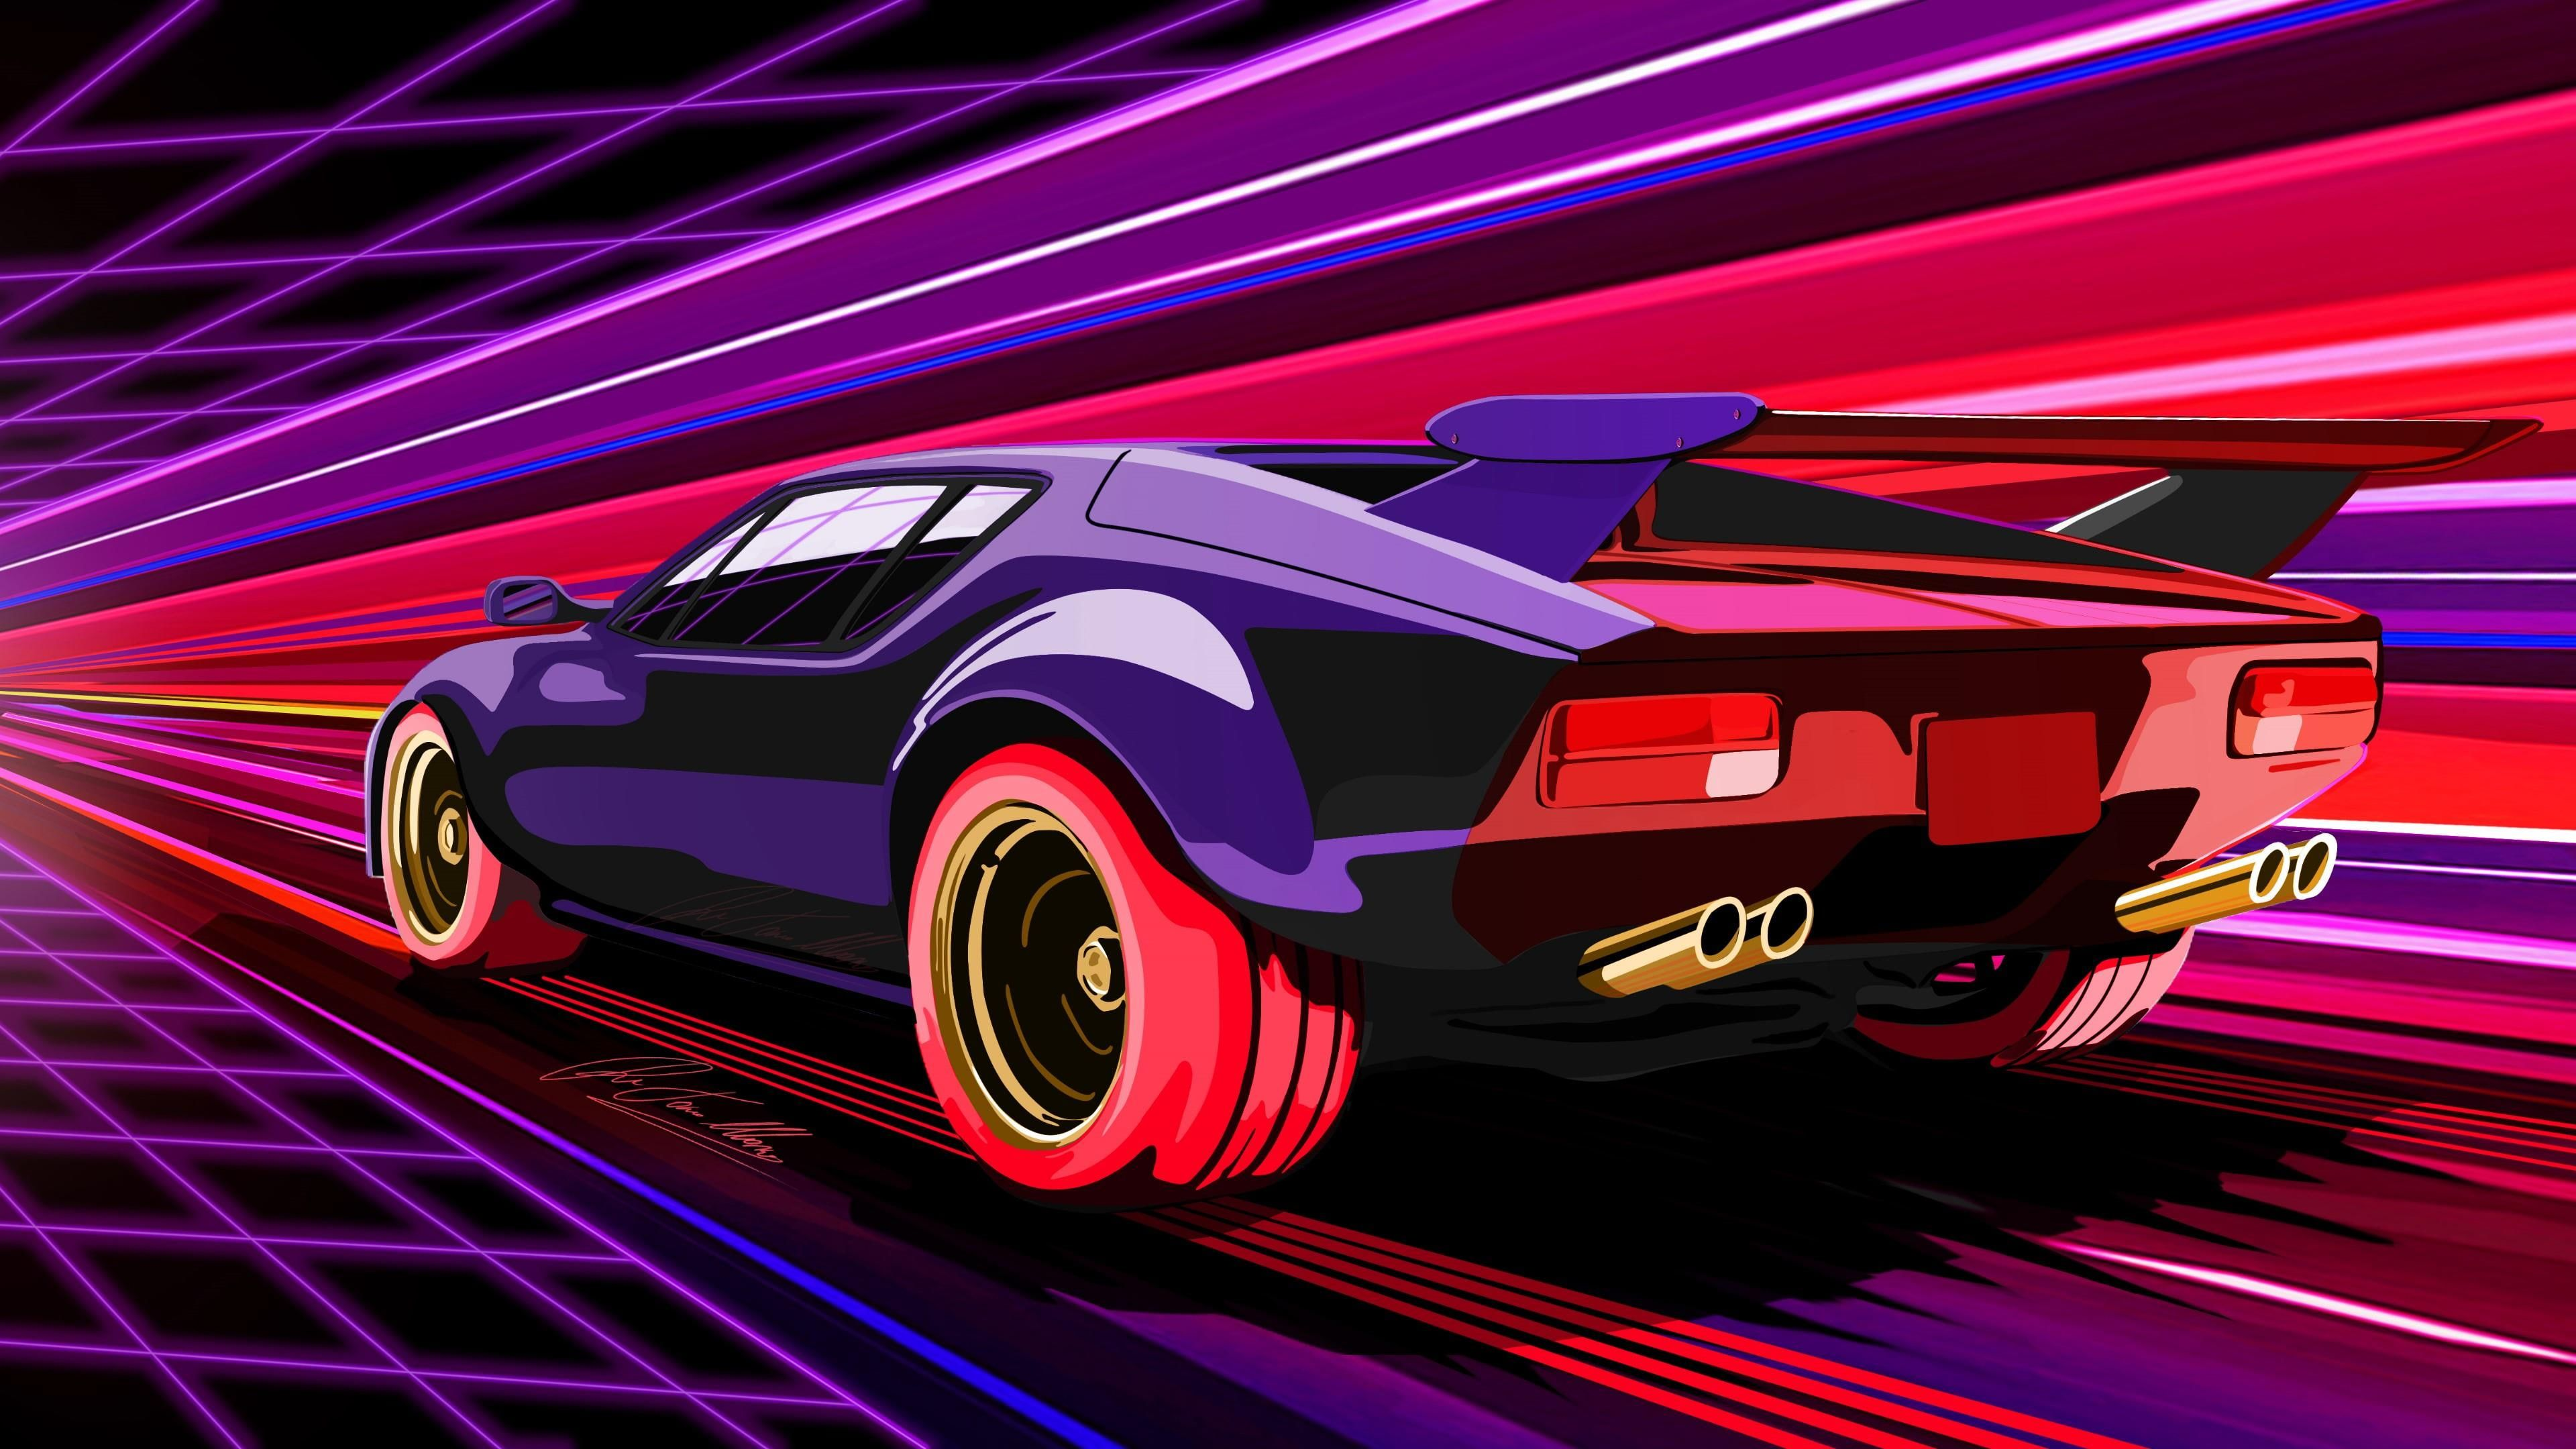 Retrowave Car Vehicle Sports Car Synthwave 80s 1980s Performance Car Race Car Graphics Neon Light Concept Car Neo Car Artwork Art Cars Car Illustration